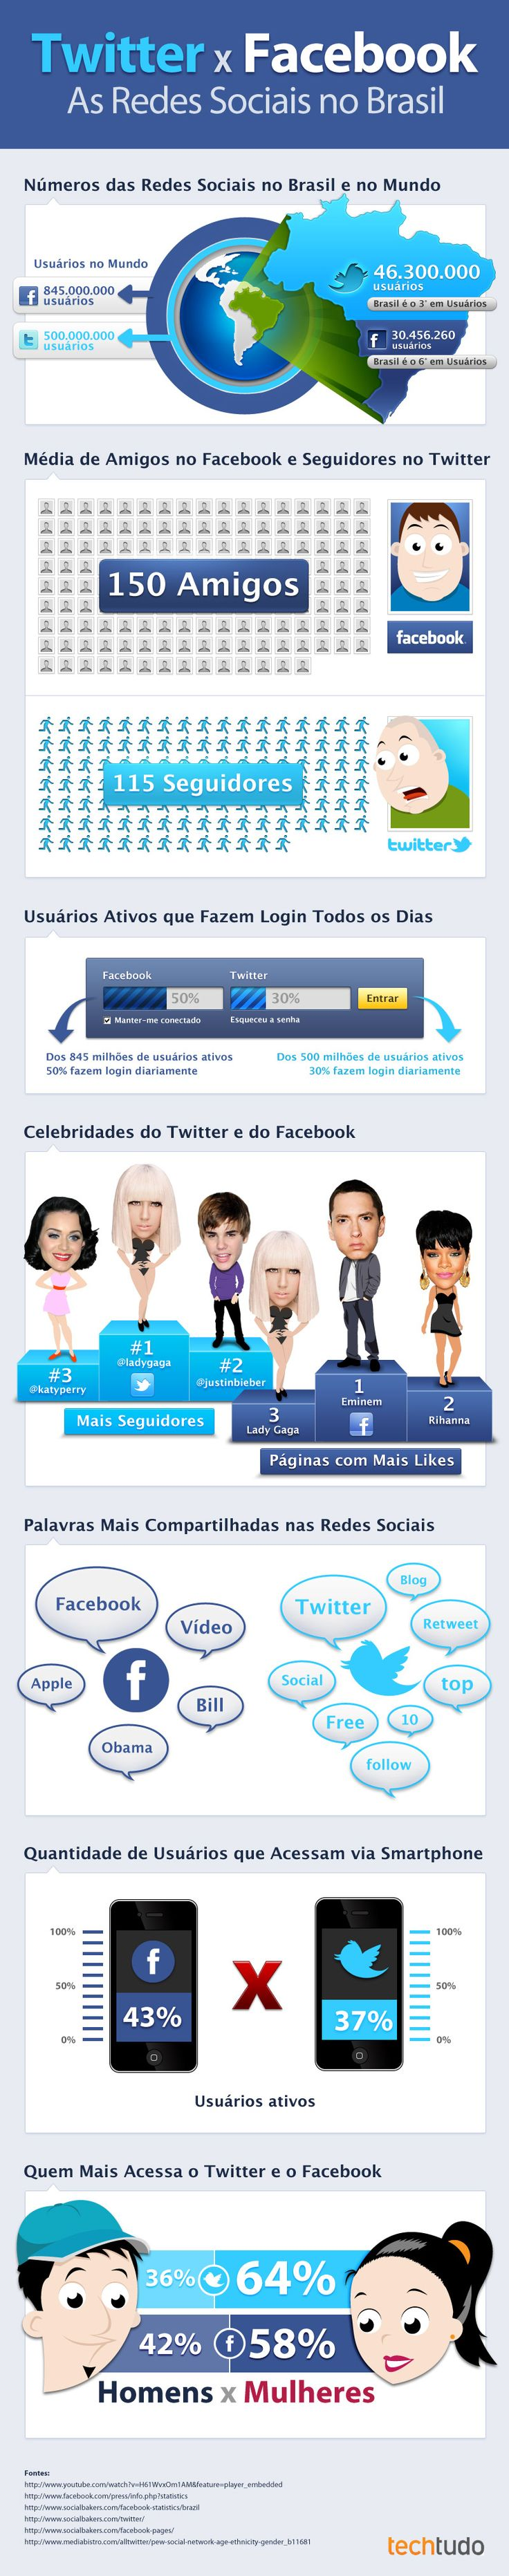 Cool Infografic: Twitter x Facebook in Brazil / Infográfico: Twitter x Facebook no Brasil